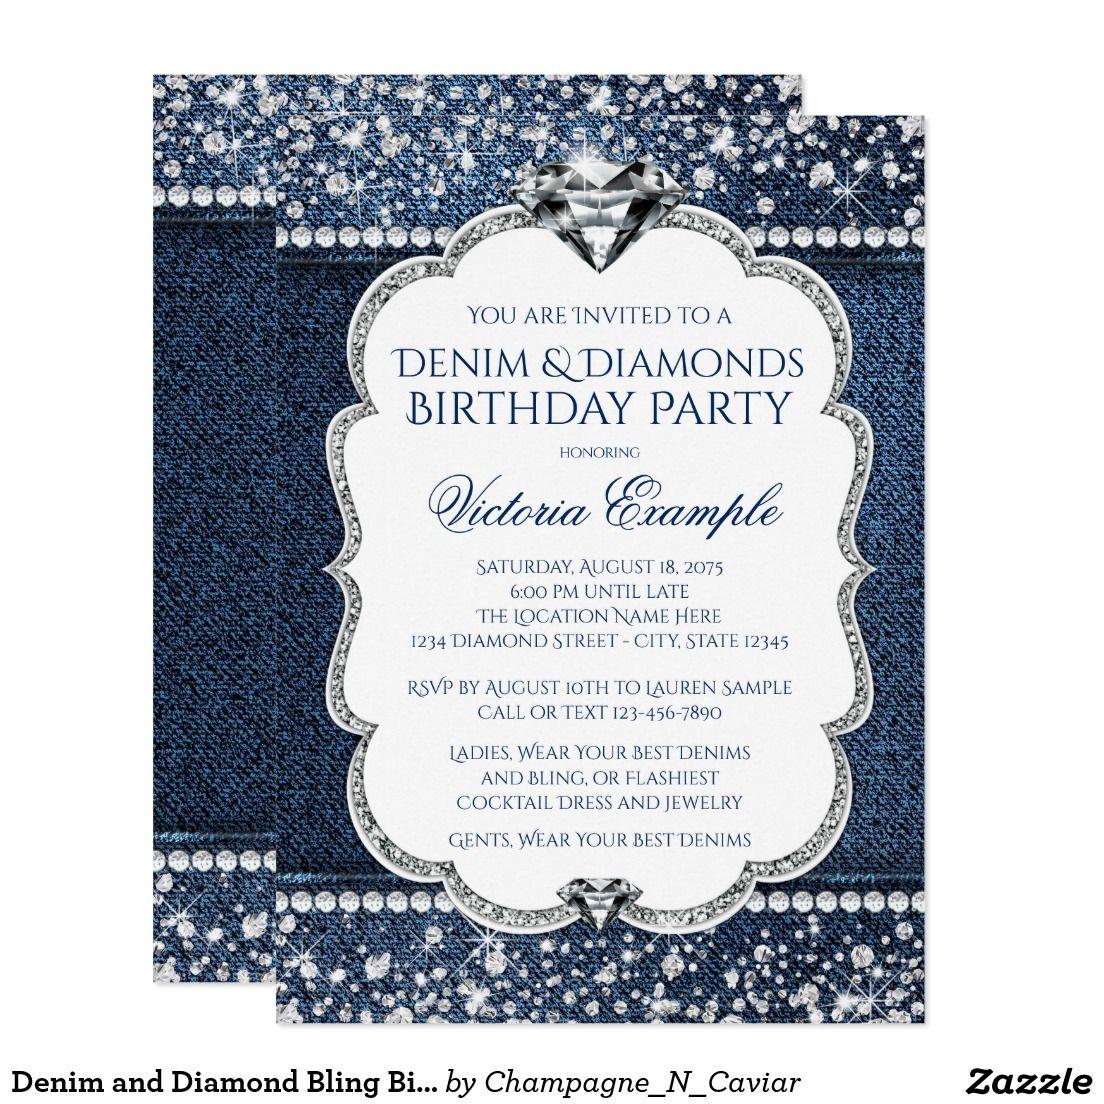 Denim and Diamond Bling Birthday Party Invitations | Denim and ...